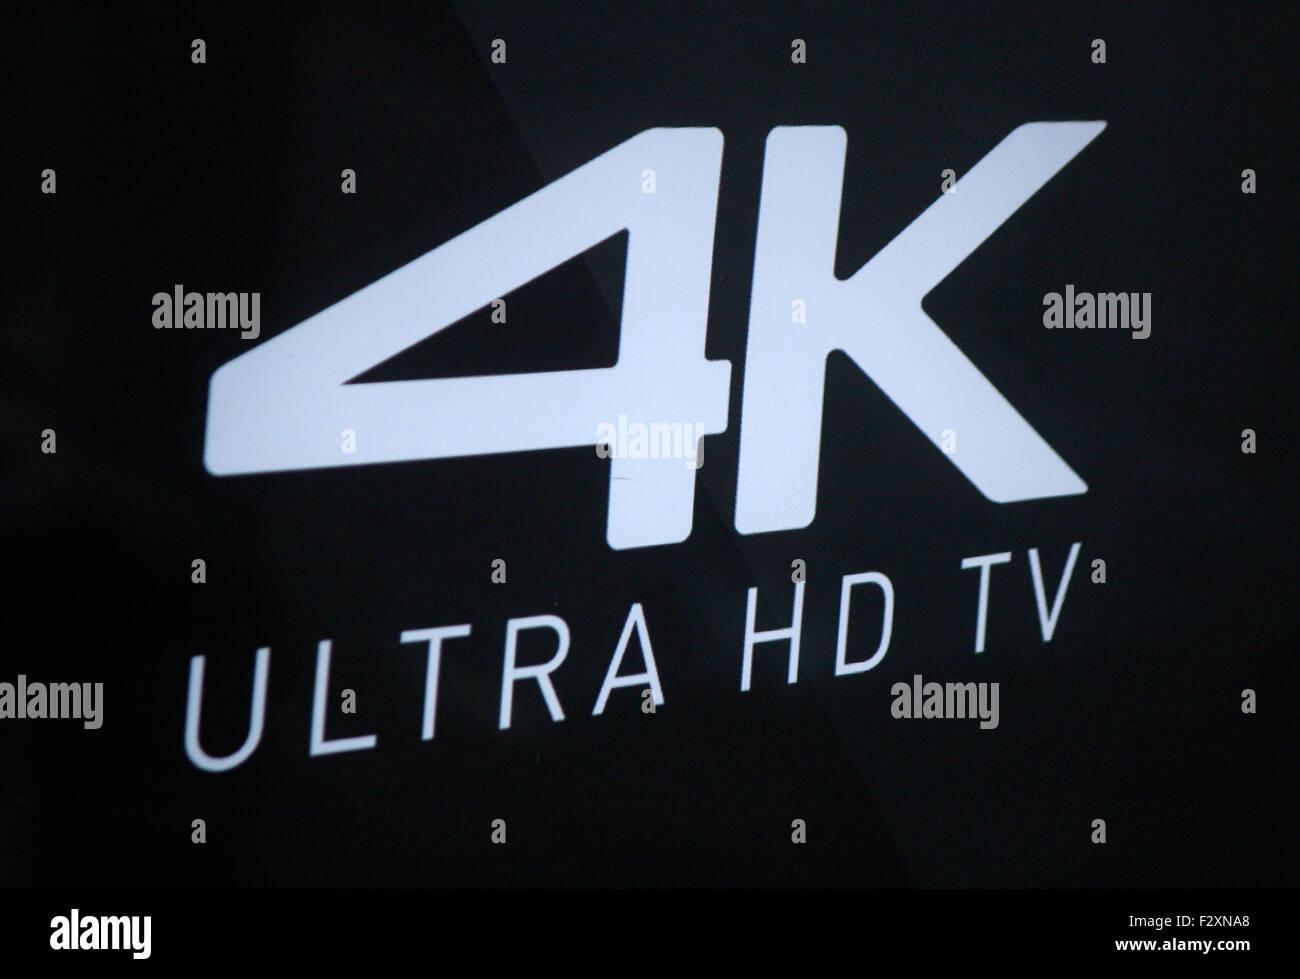 Markenname: '4k Ultra HD TV', Berlin. - Stock Image